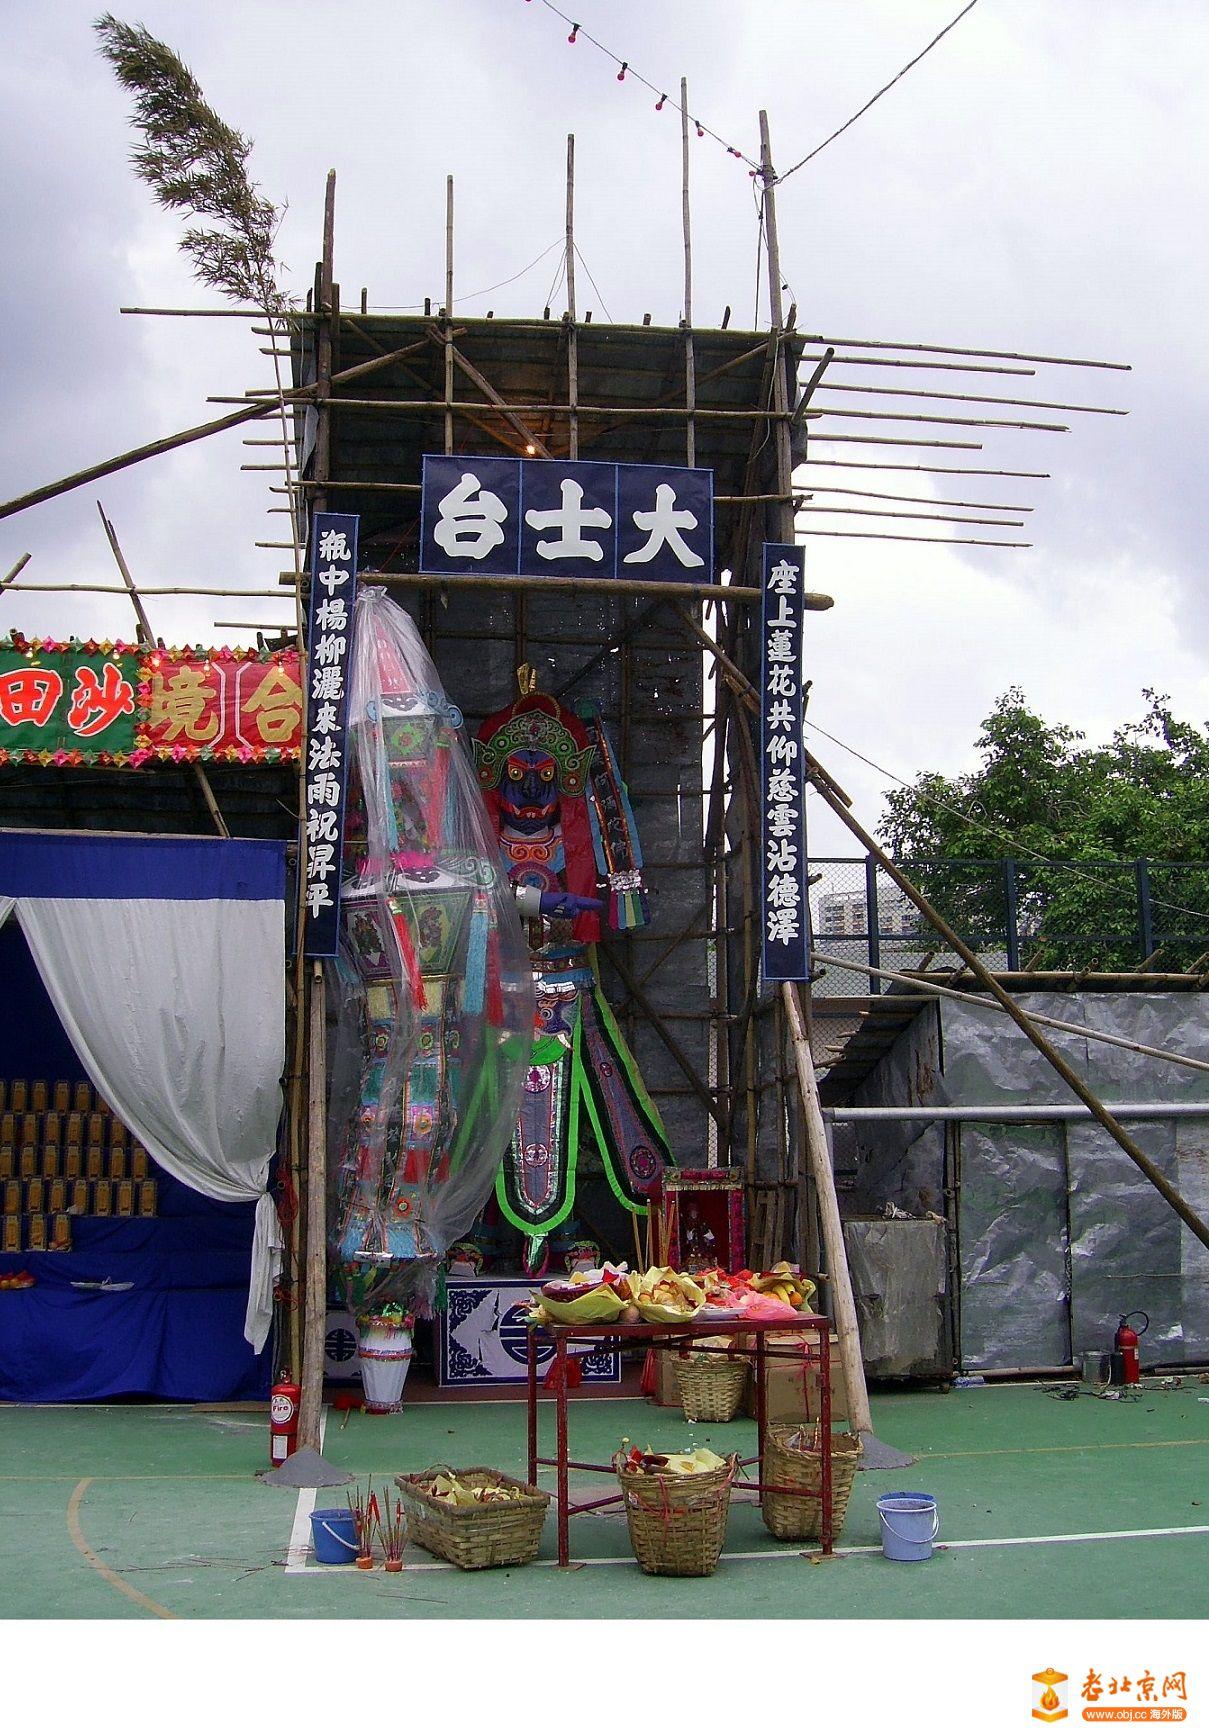 HK_ShatinYuLanFestival_KingOfGhost1.jpg